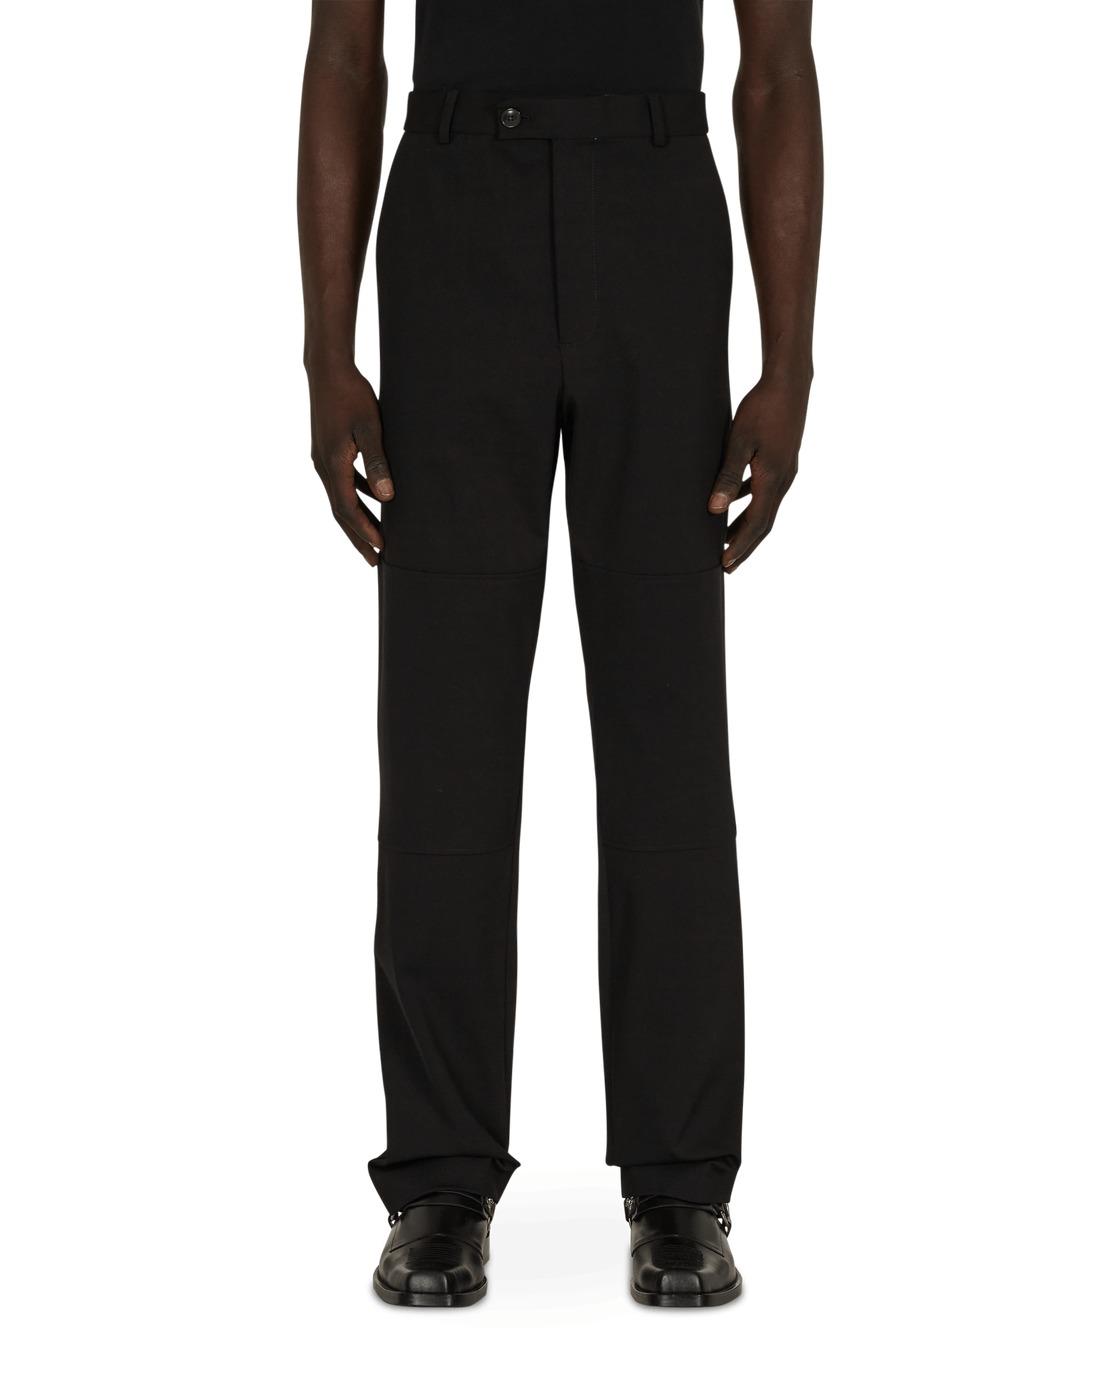 Martine Rose Ipso Trousers Black